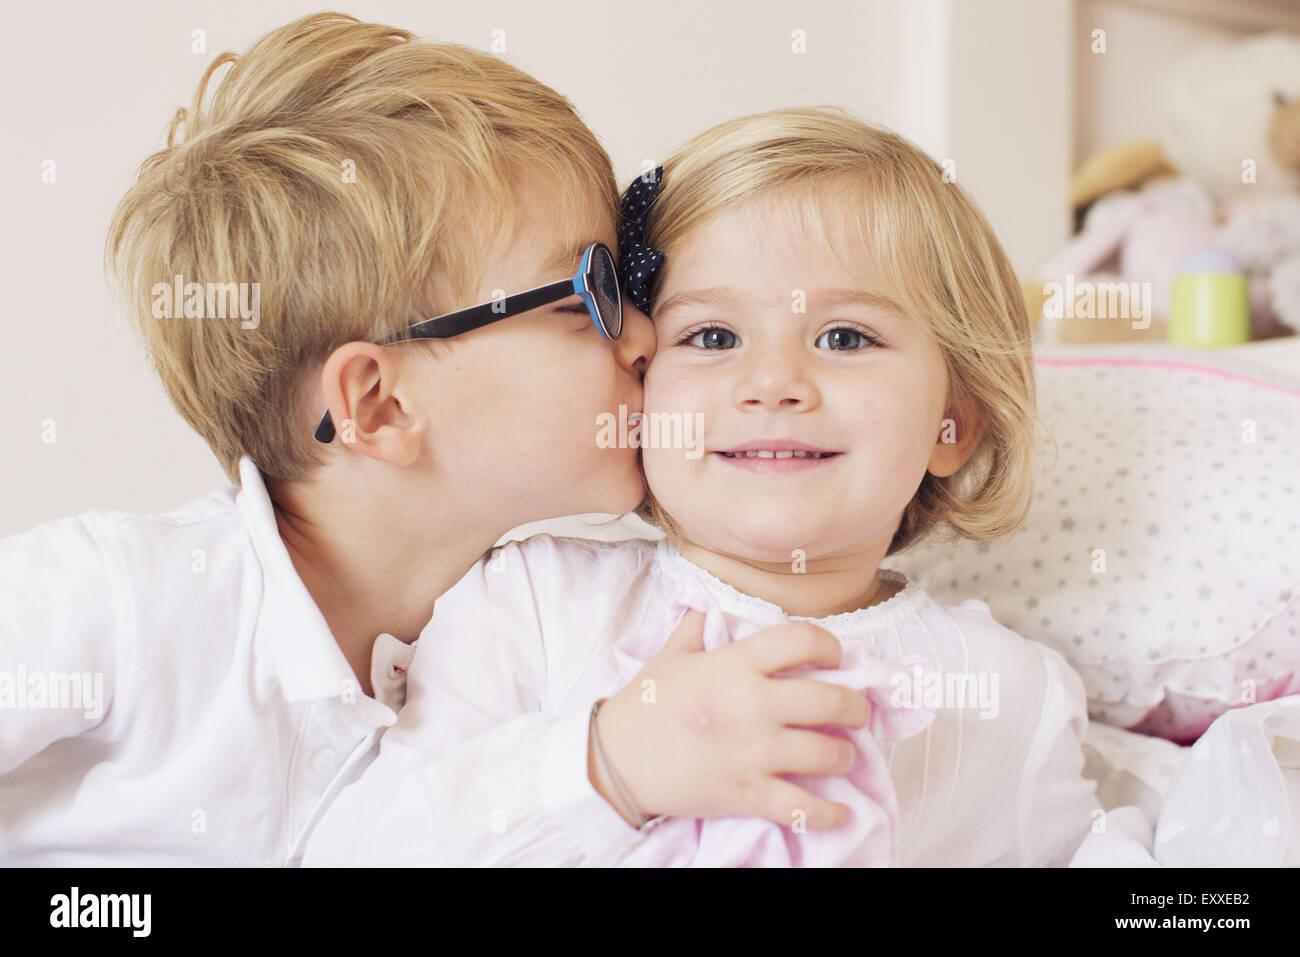 Boy kissing sister's cheek Stock Photo